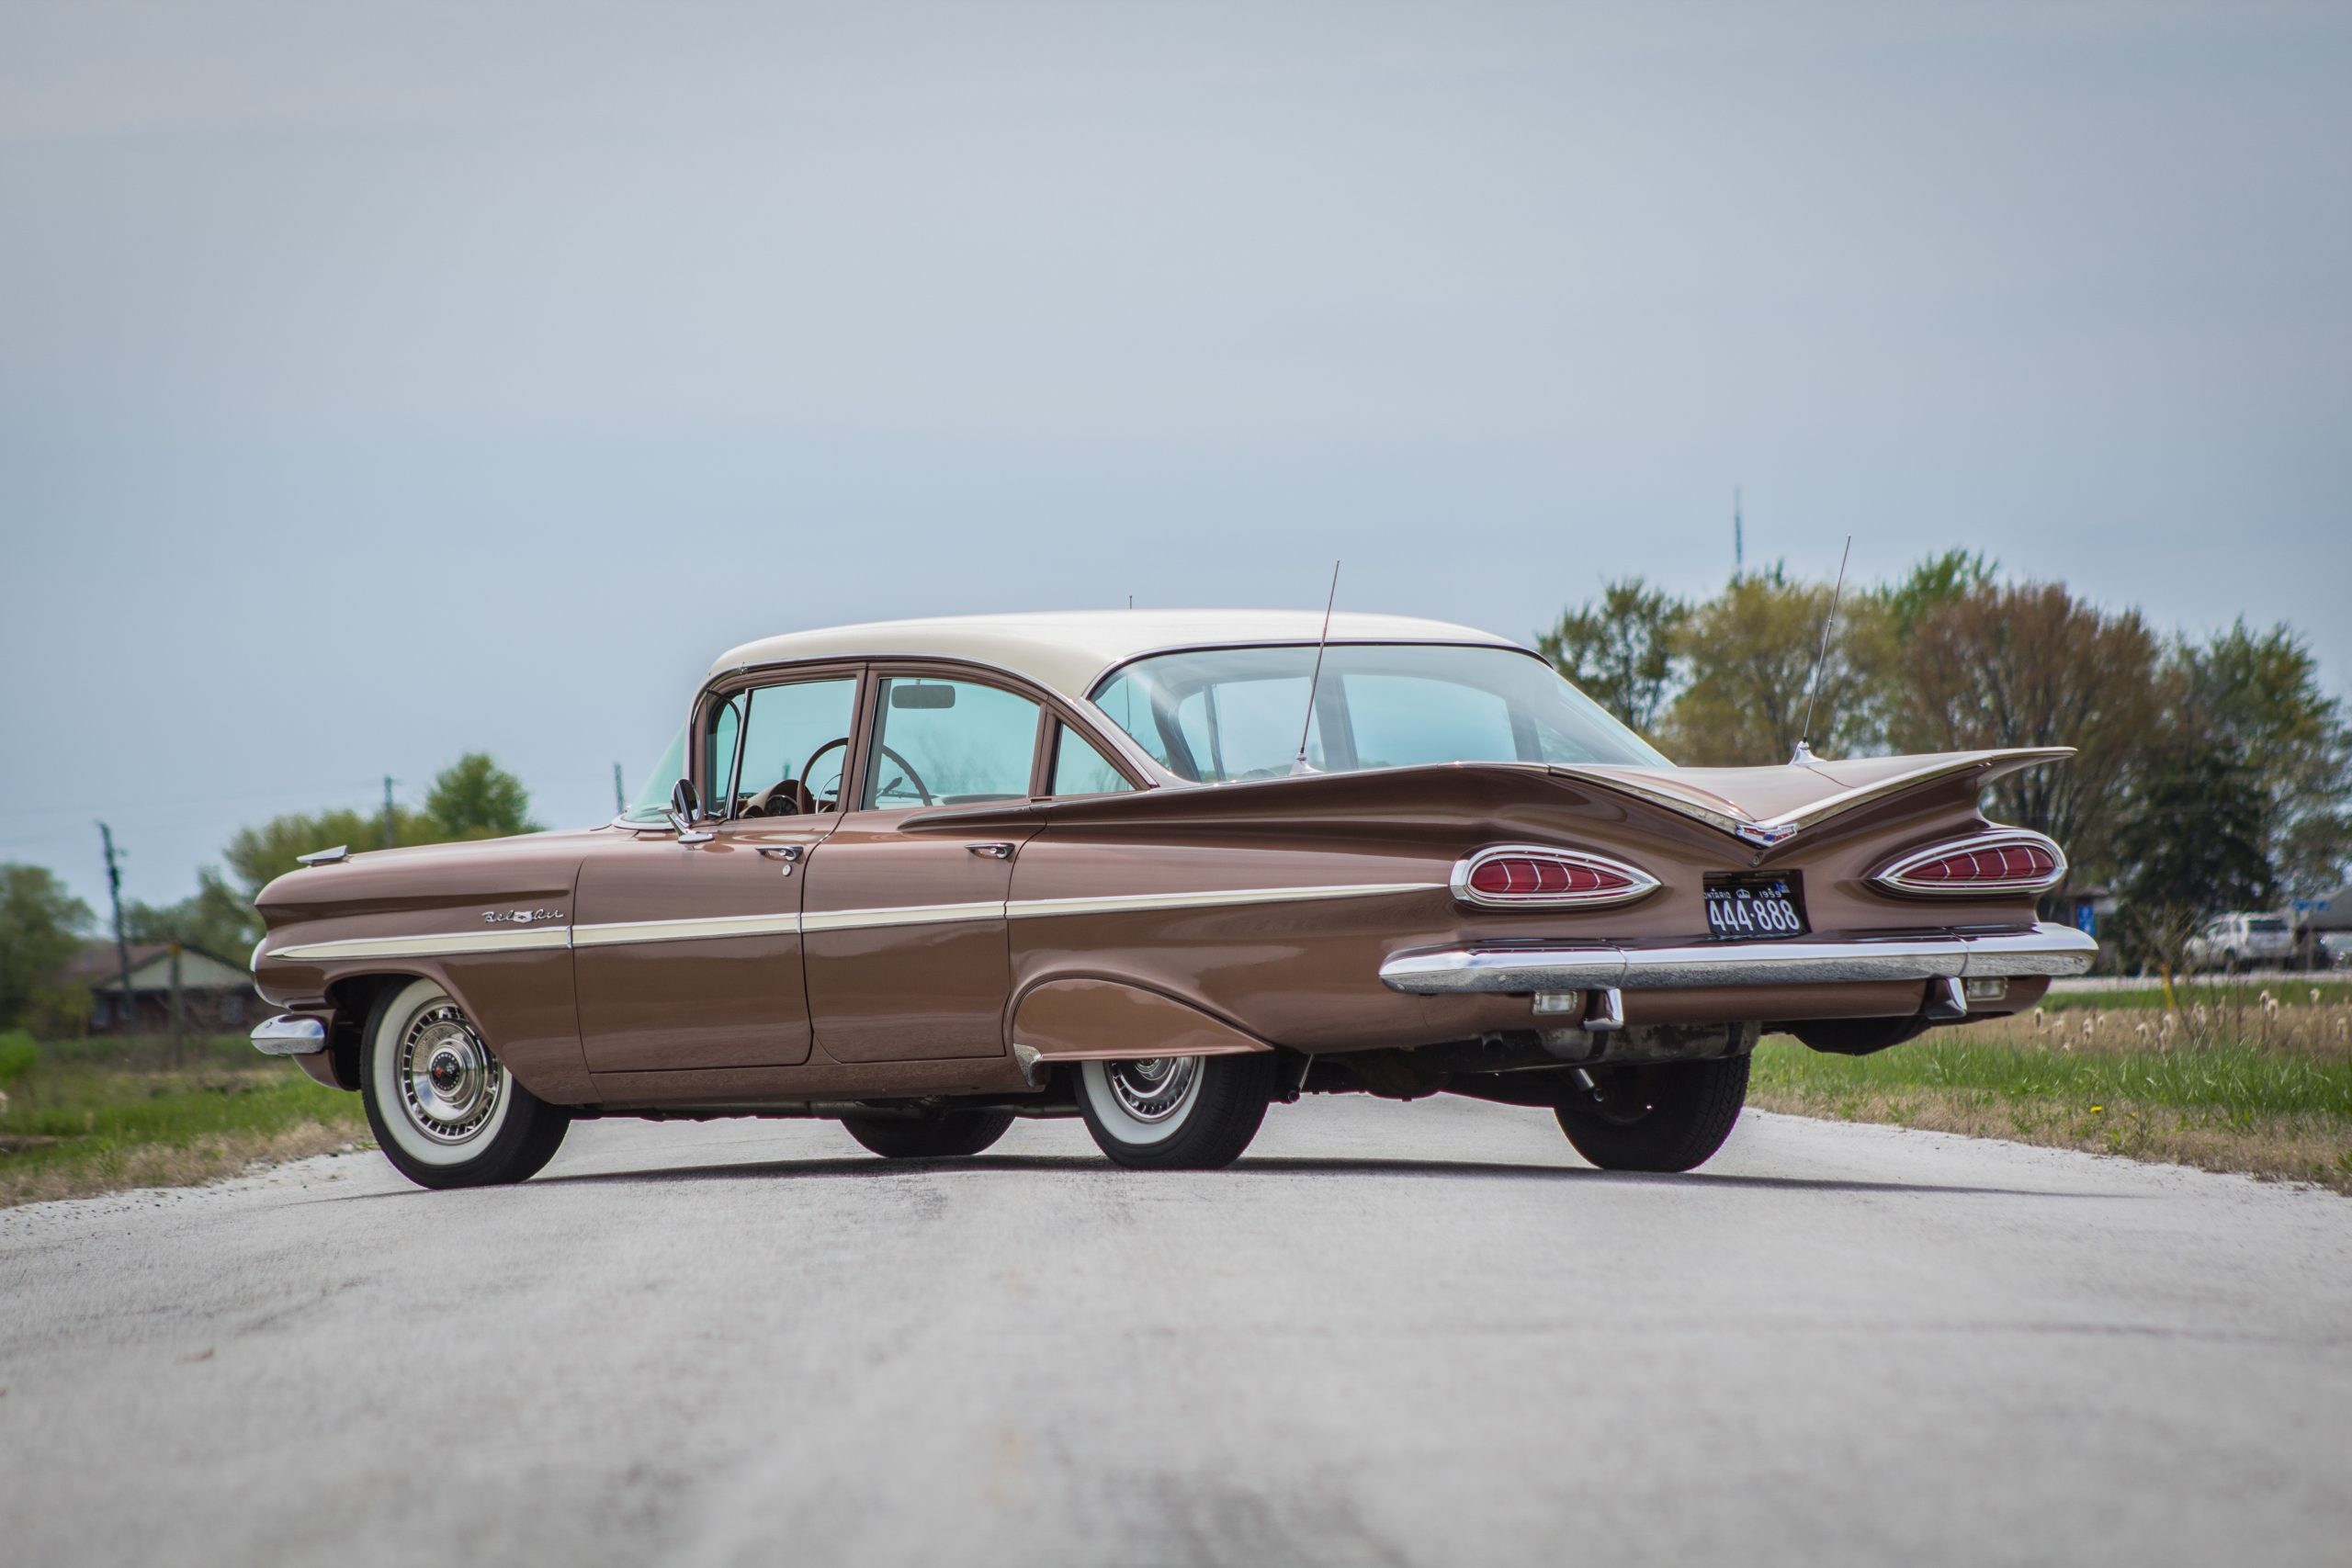 1959 Chevrolet Bel Air side